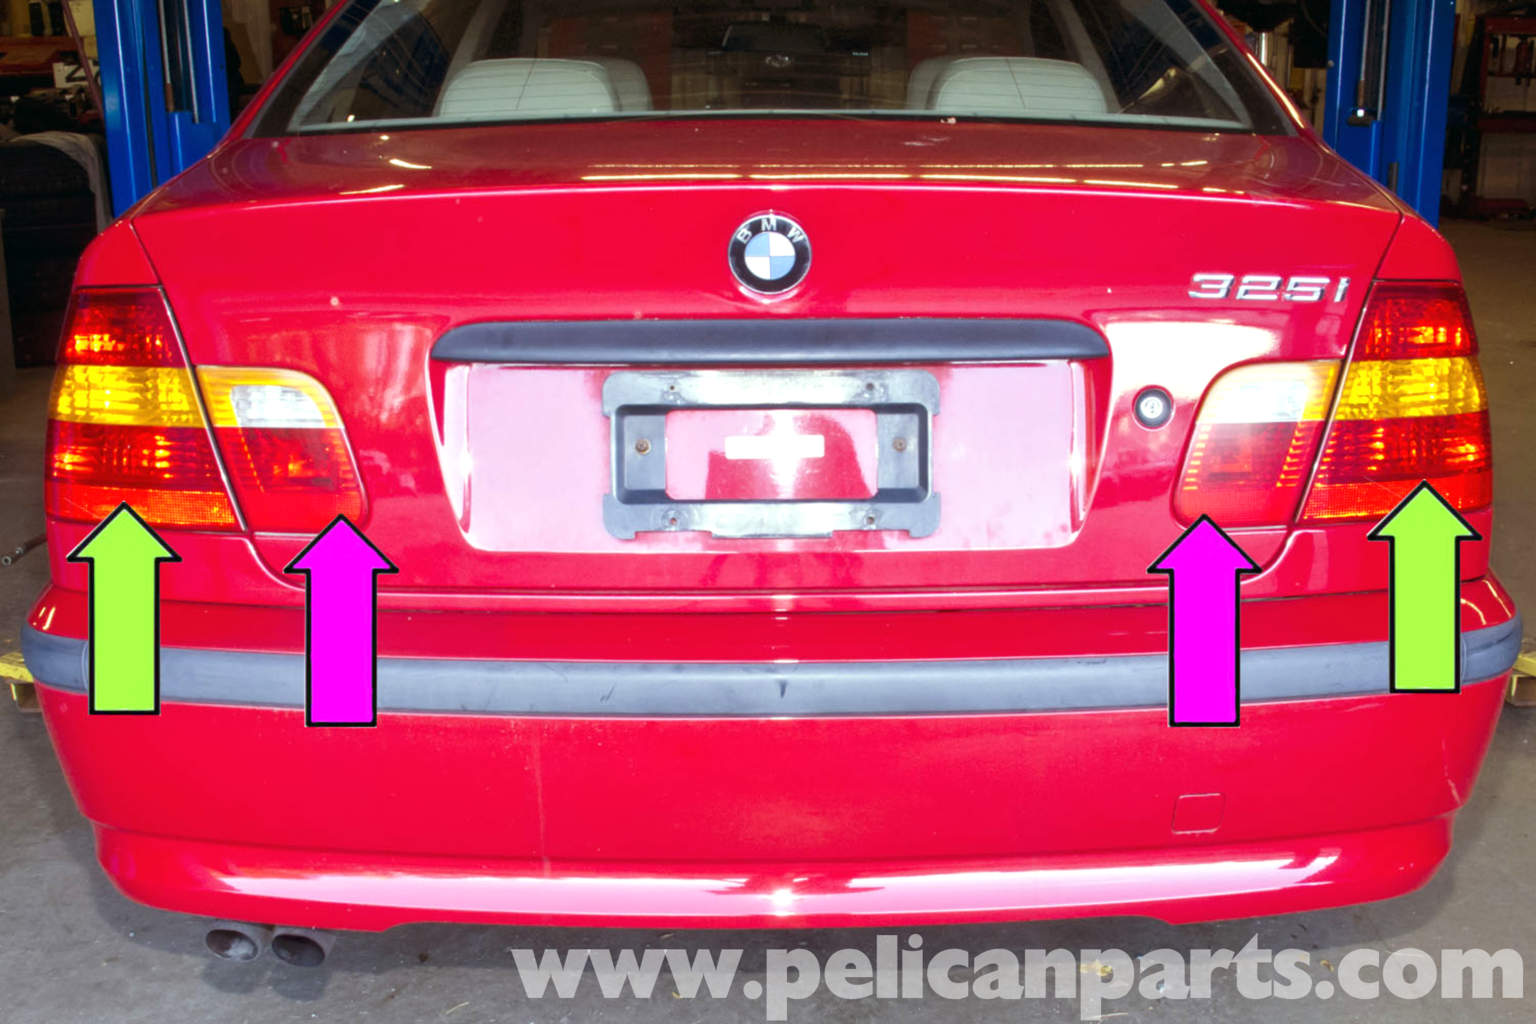 hight resolution of bmw e46 rear tail light replacement bmw 325i 2001 2005 2003 bmw 325i 2005 bmw 325i